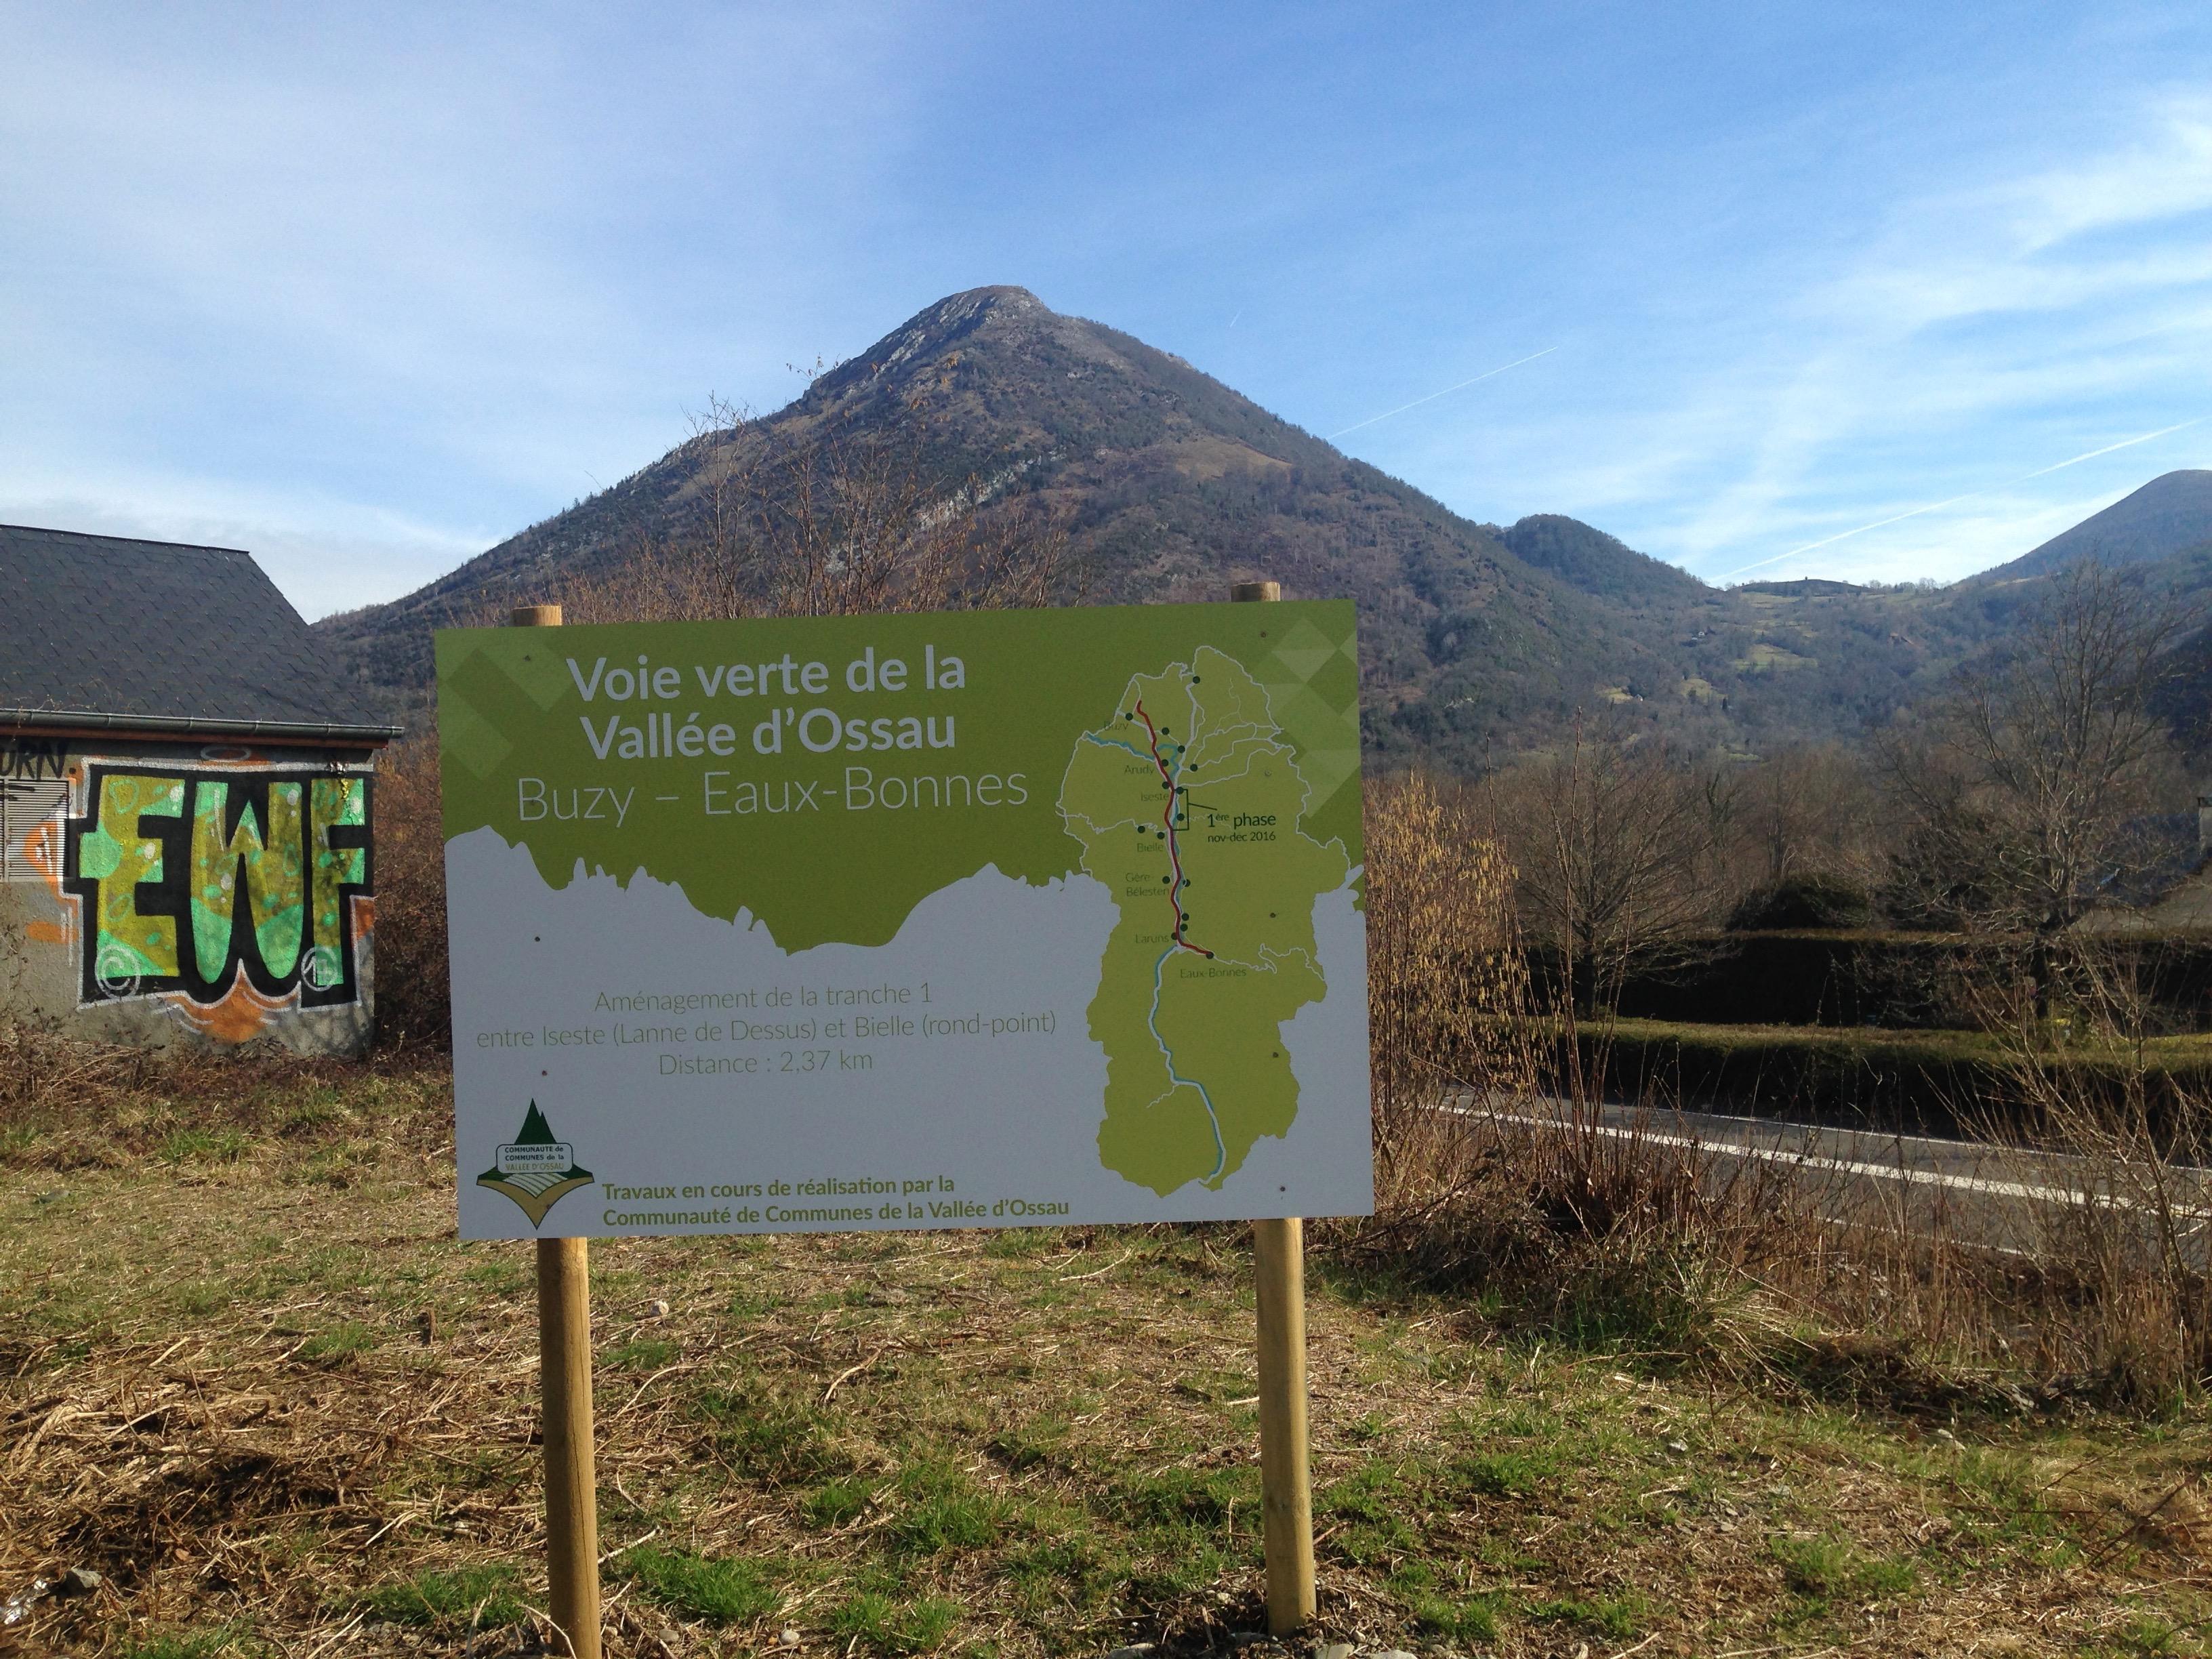 Voie verte de la Vallée d'Ossau – Louvie-Juzon (64)